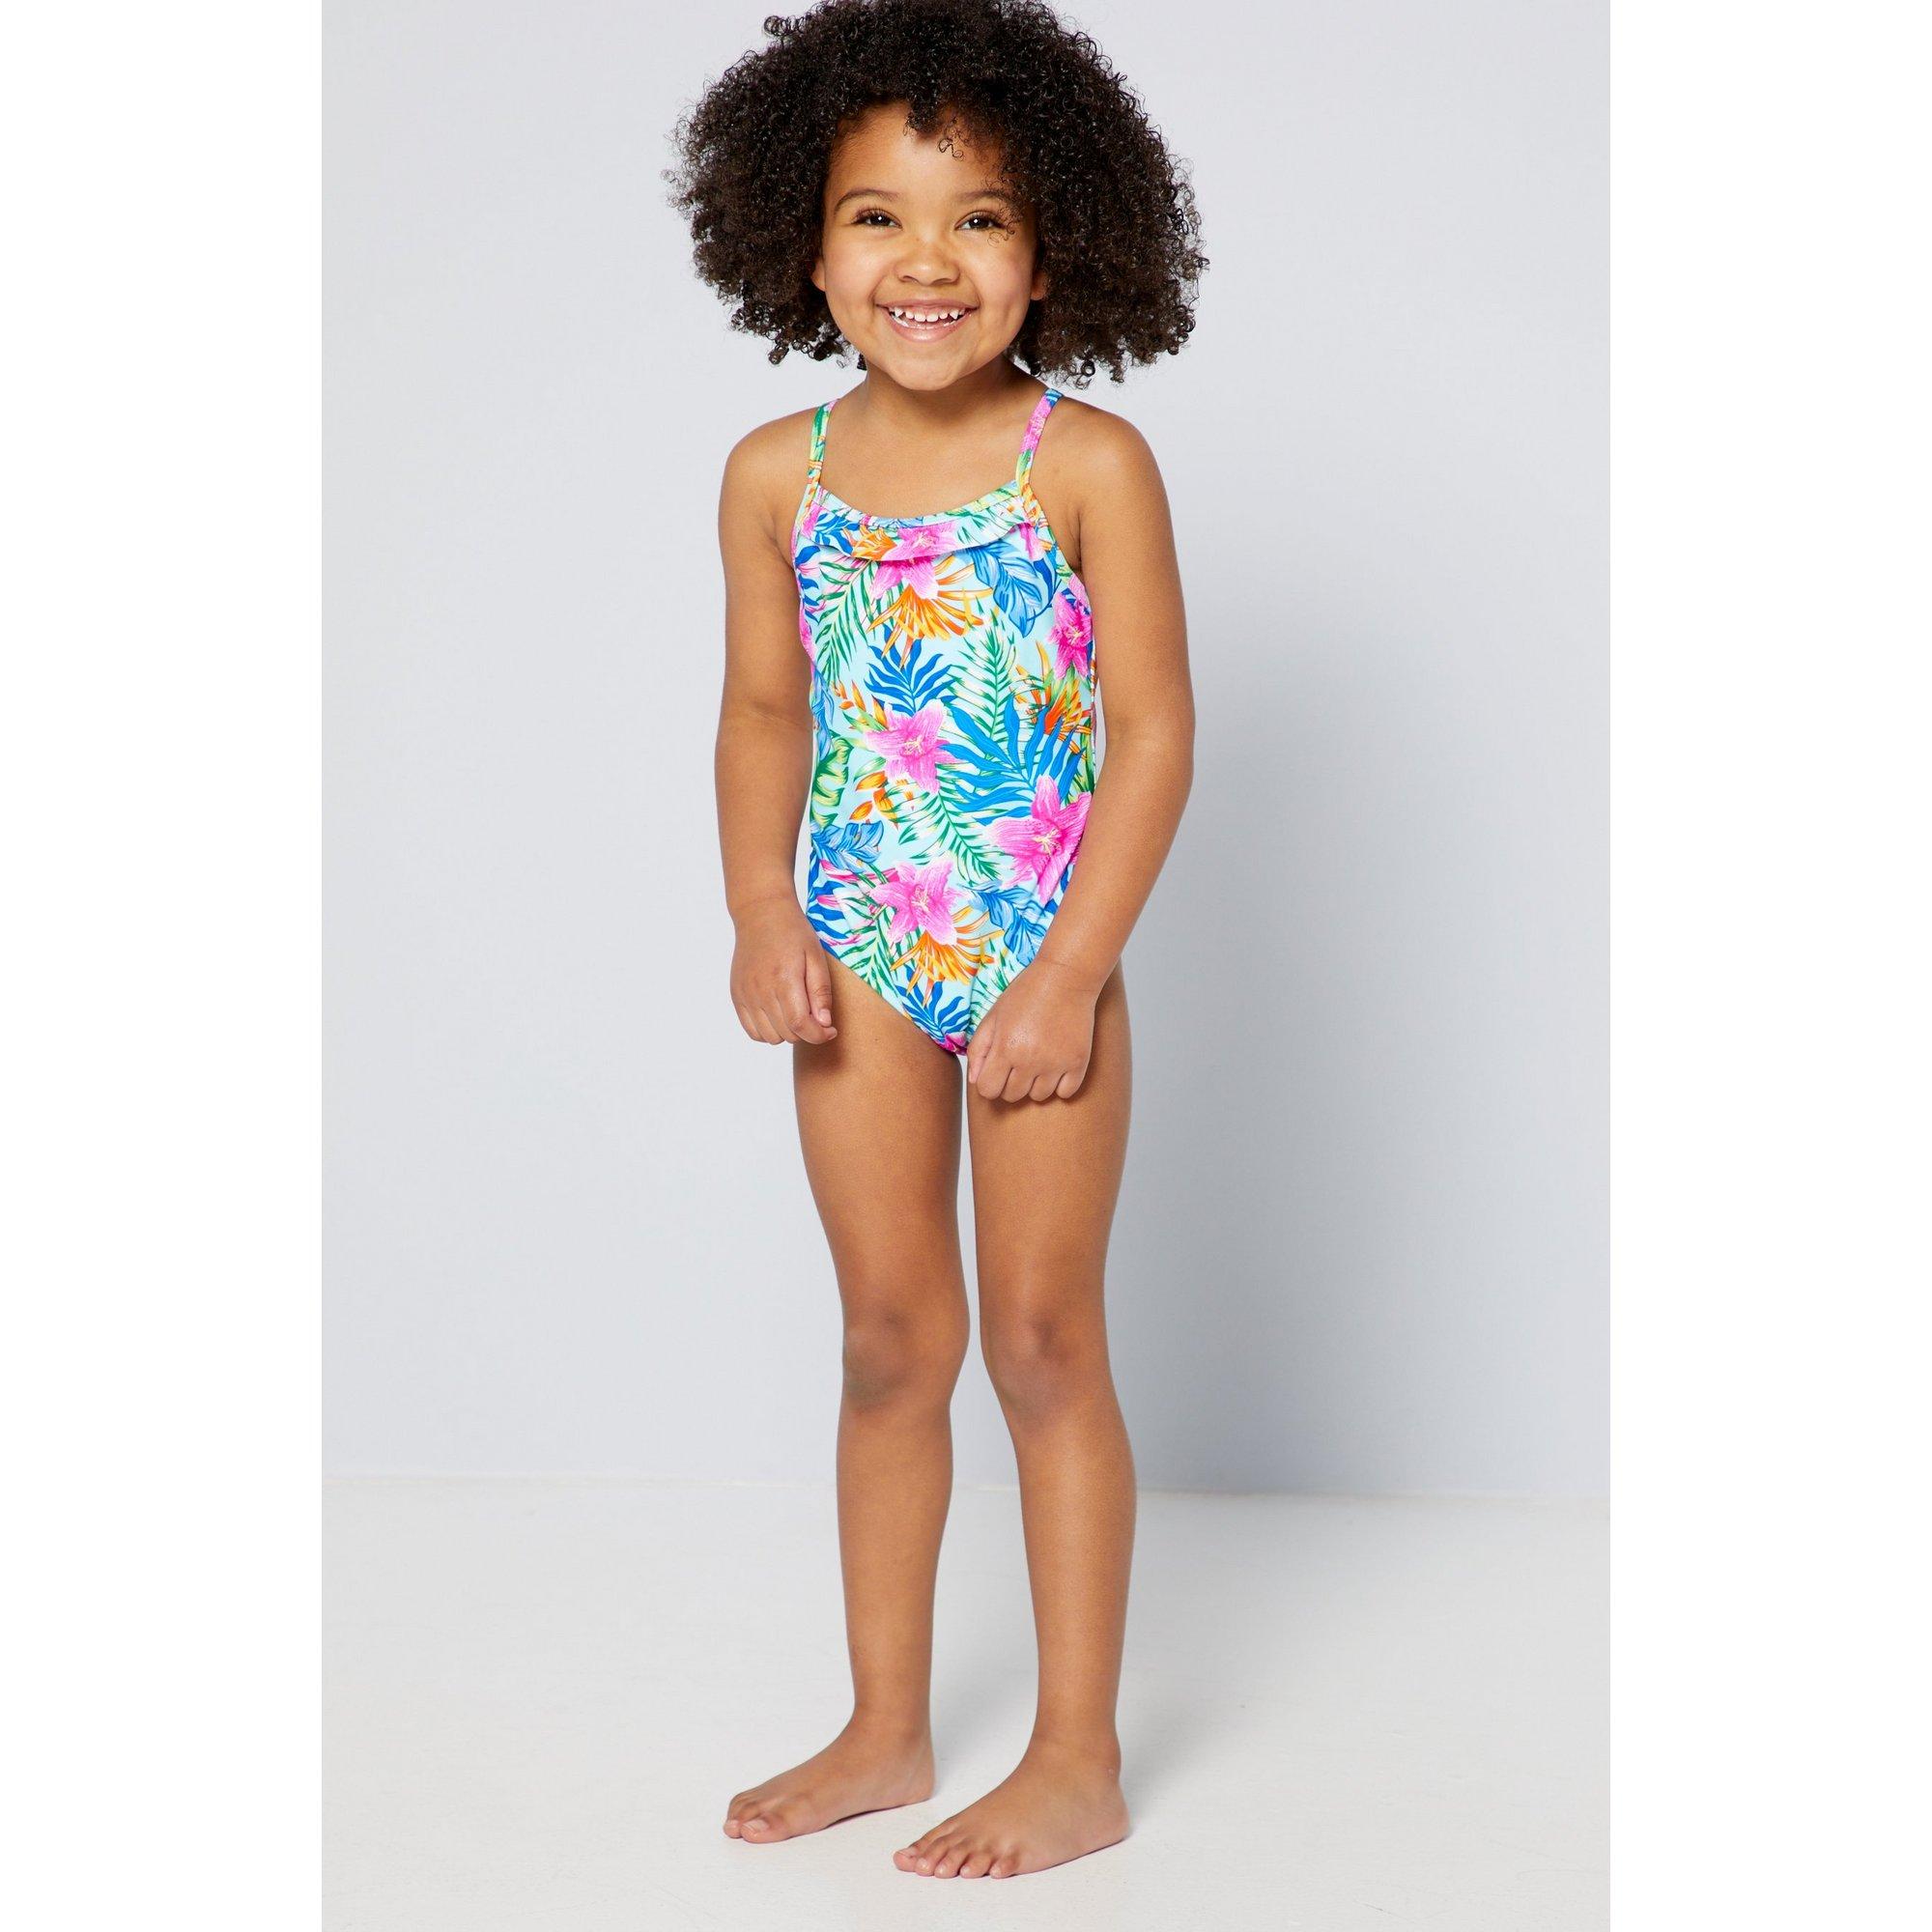 Image of Girls Rainbow Island Family Swimsuit